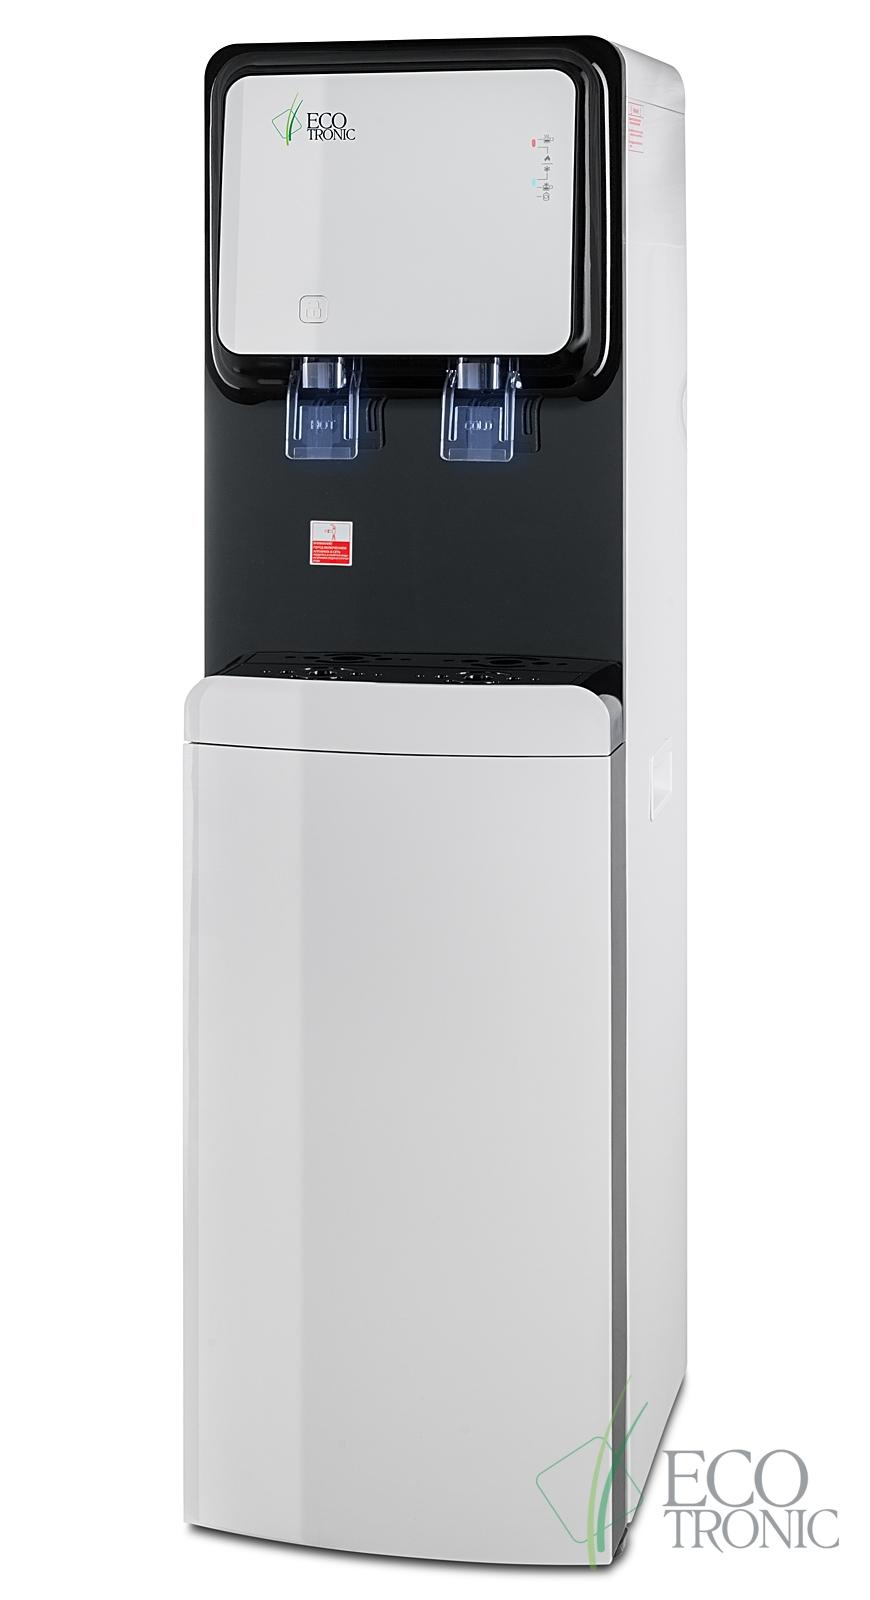 Кулер с нижней загрузкой бутыли Ecotronic M50-LXE white+black - 4